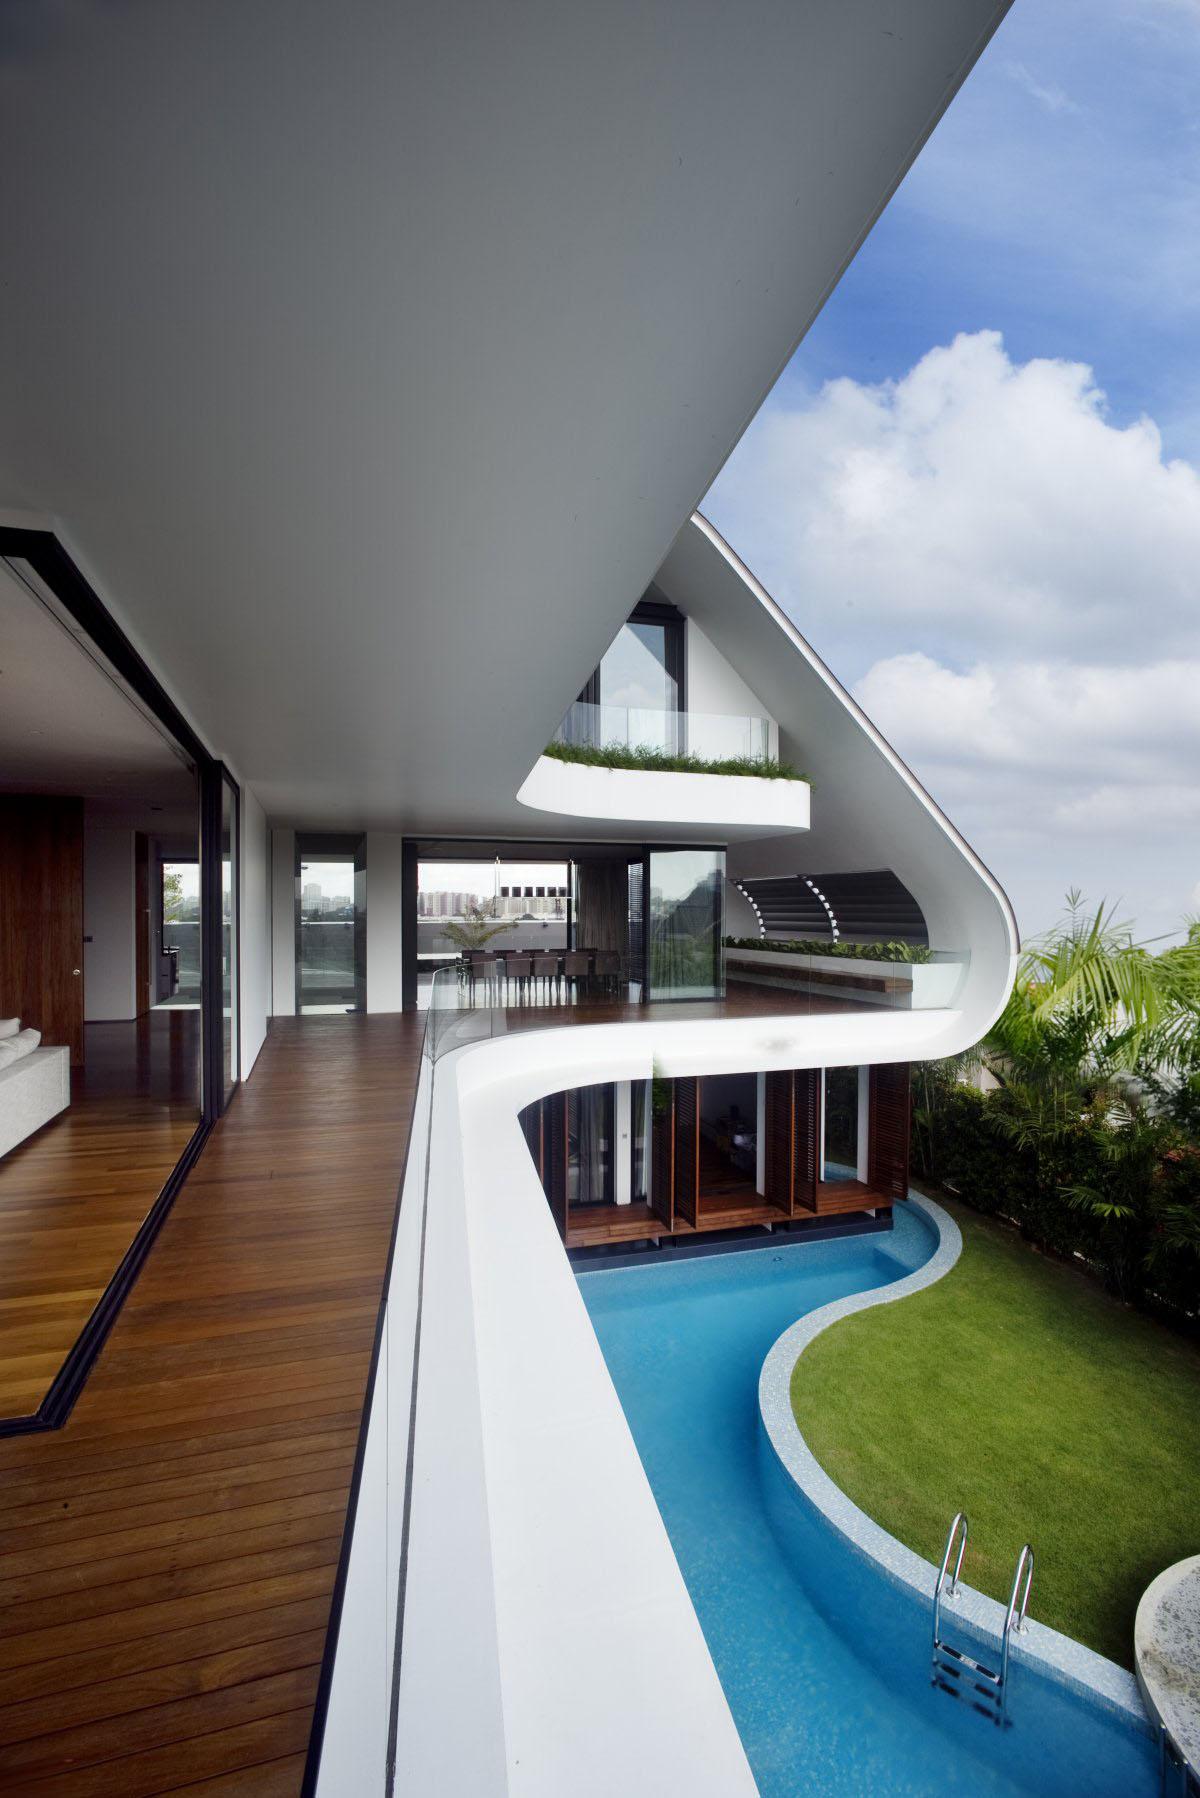 Yacht House Design In Singapore  iDesignArch  Interior